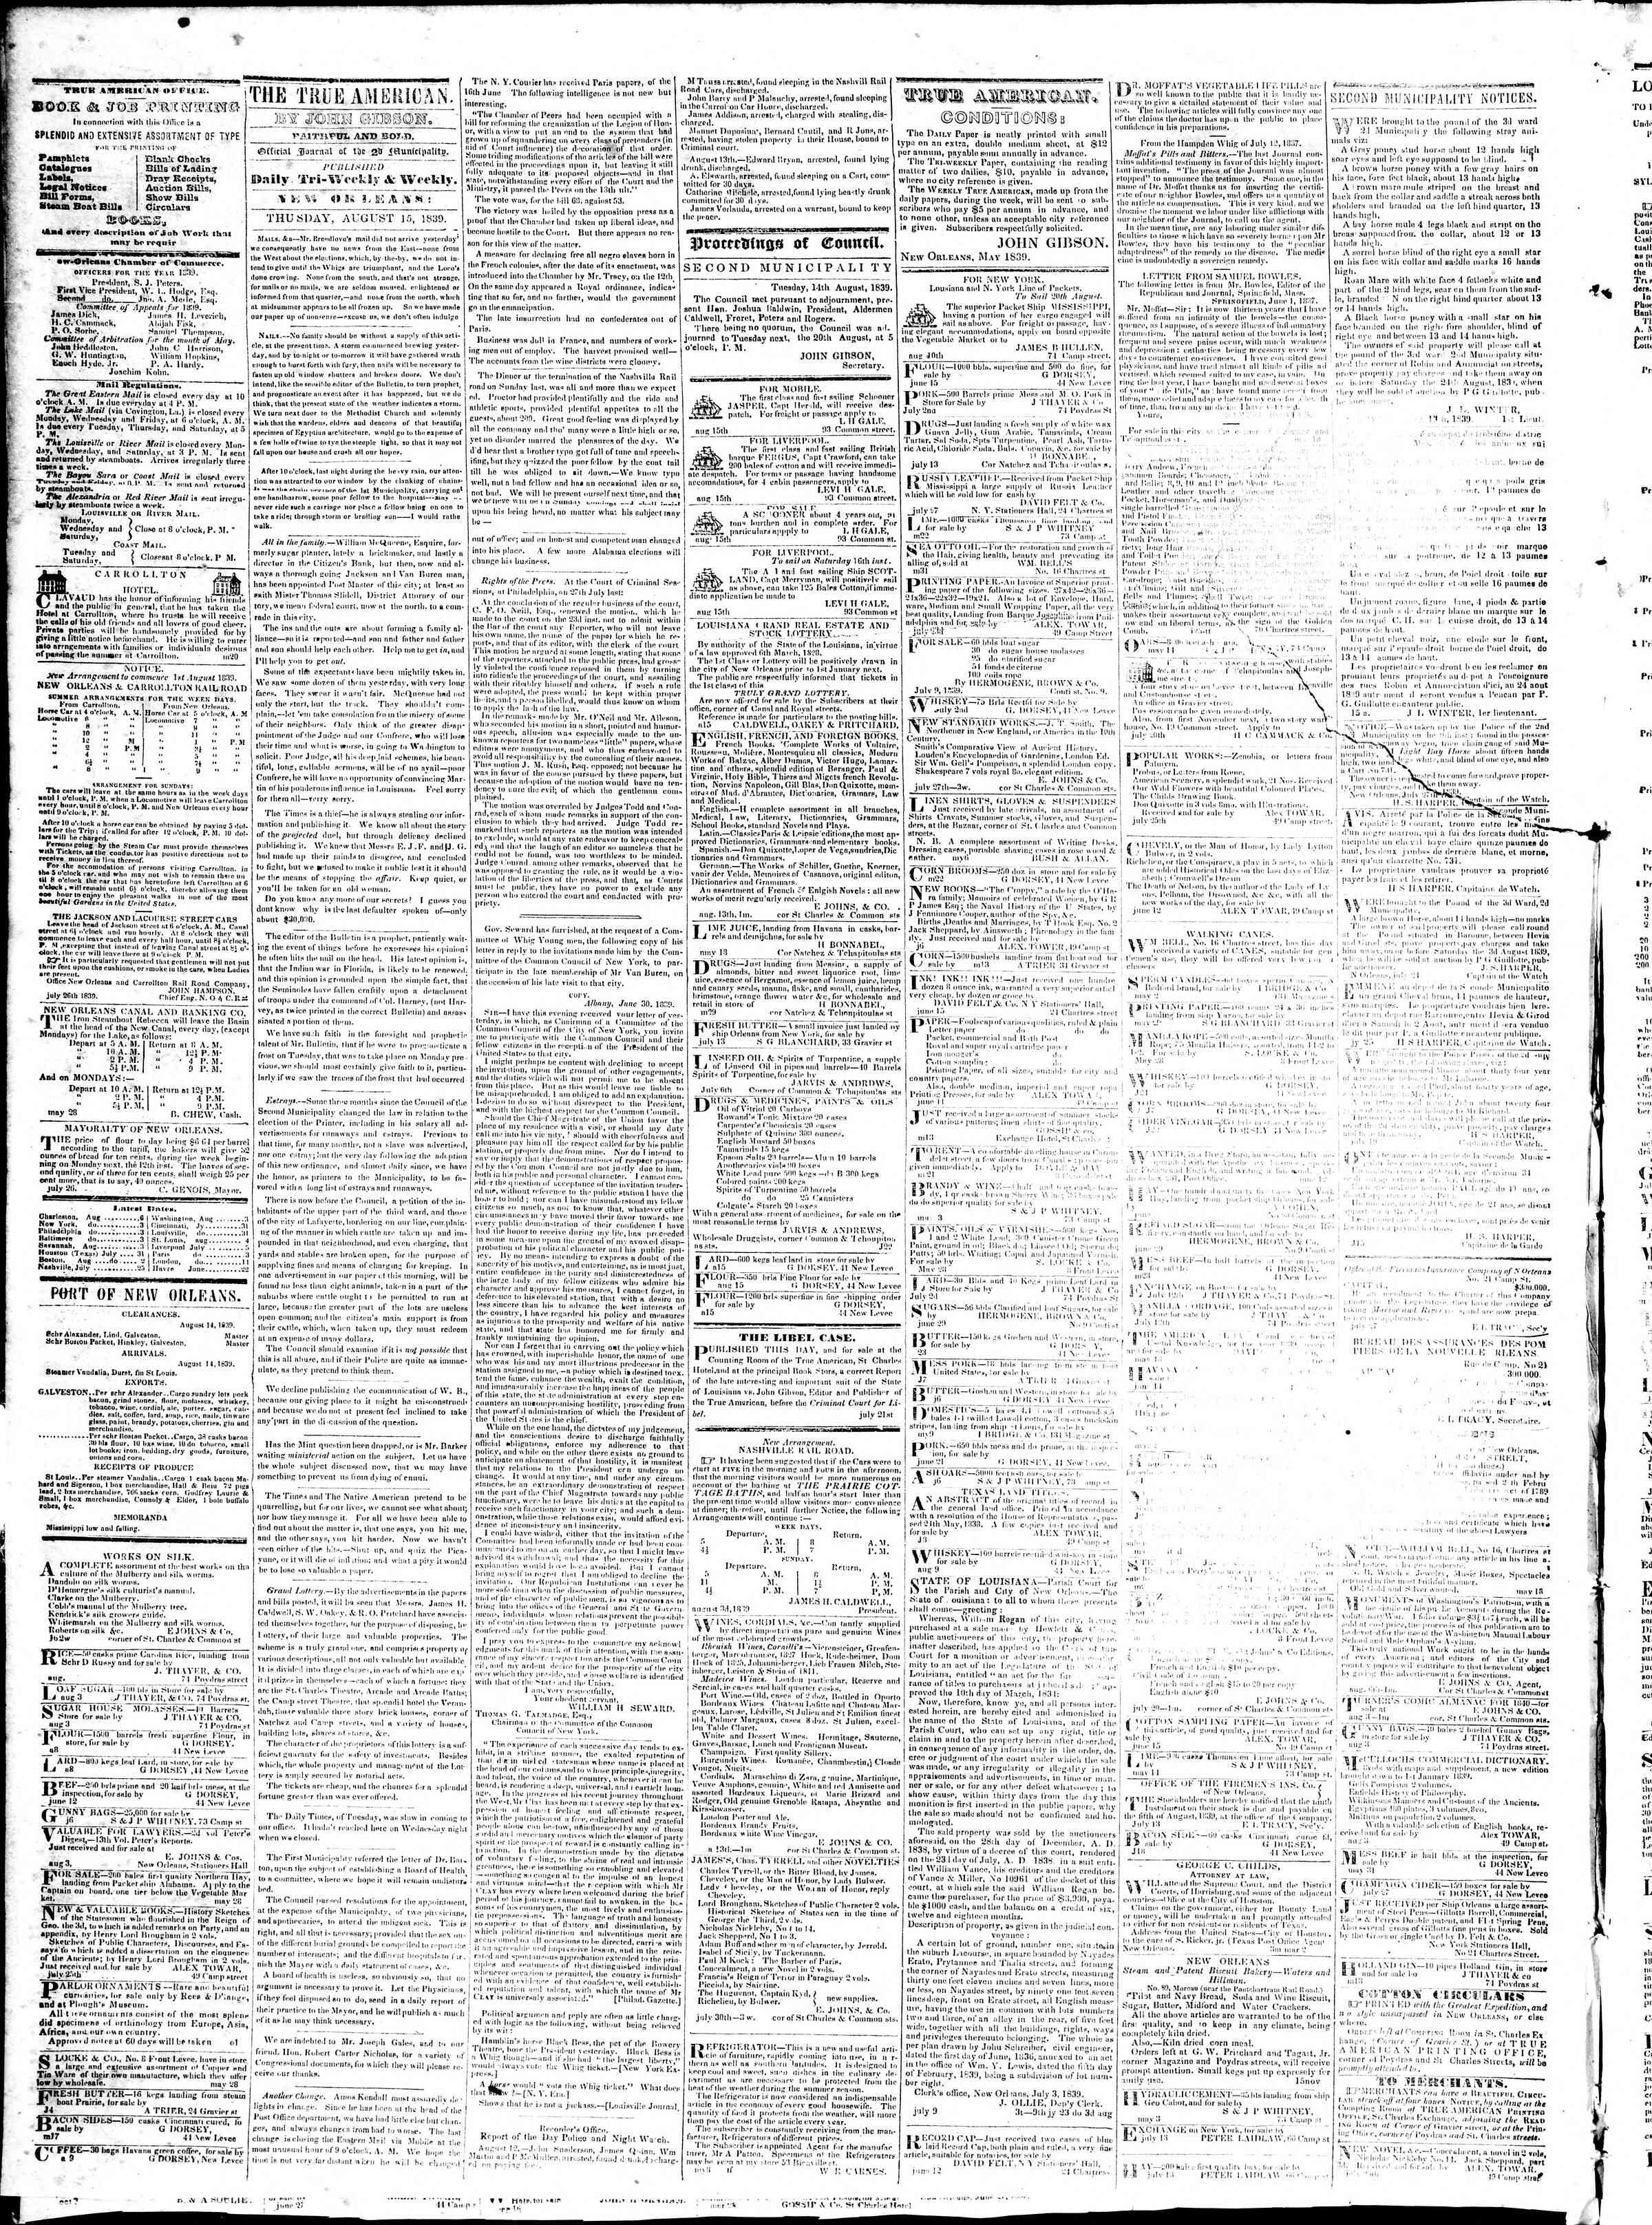 August 15, 1839 Tarihli True American Gazetesi Sayfa 2